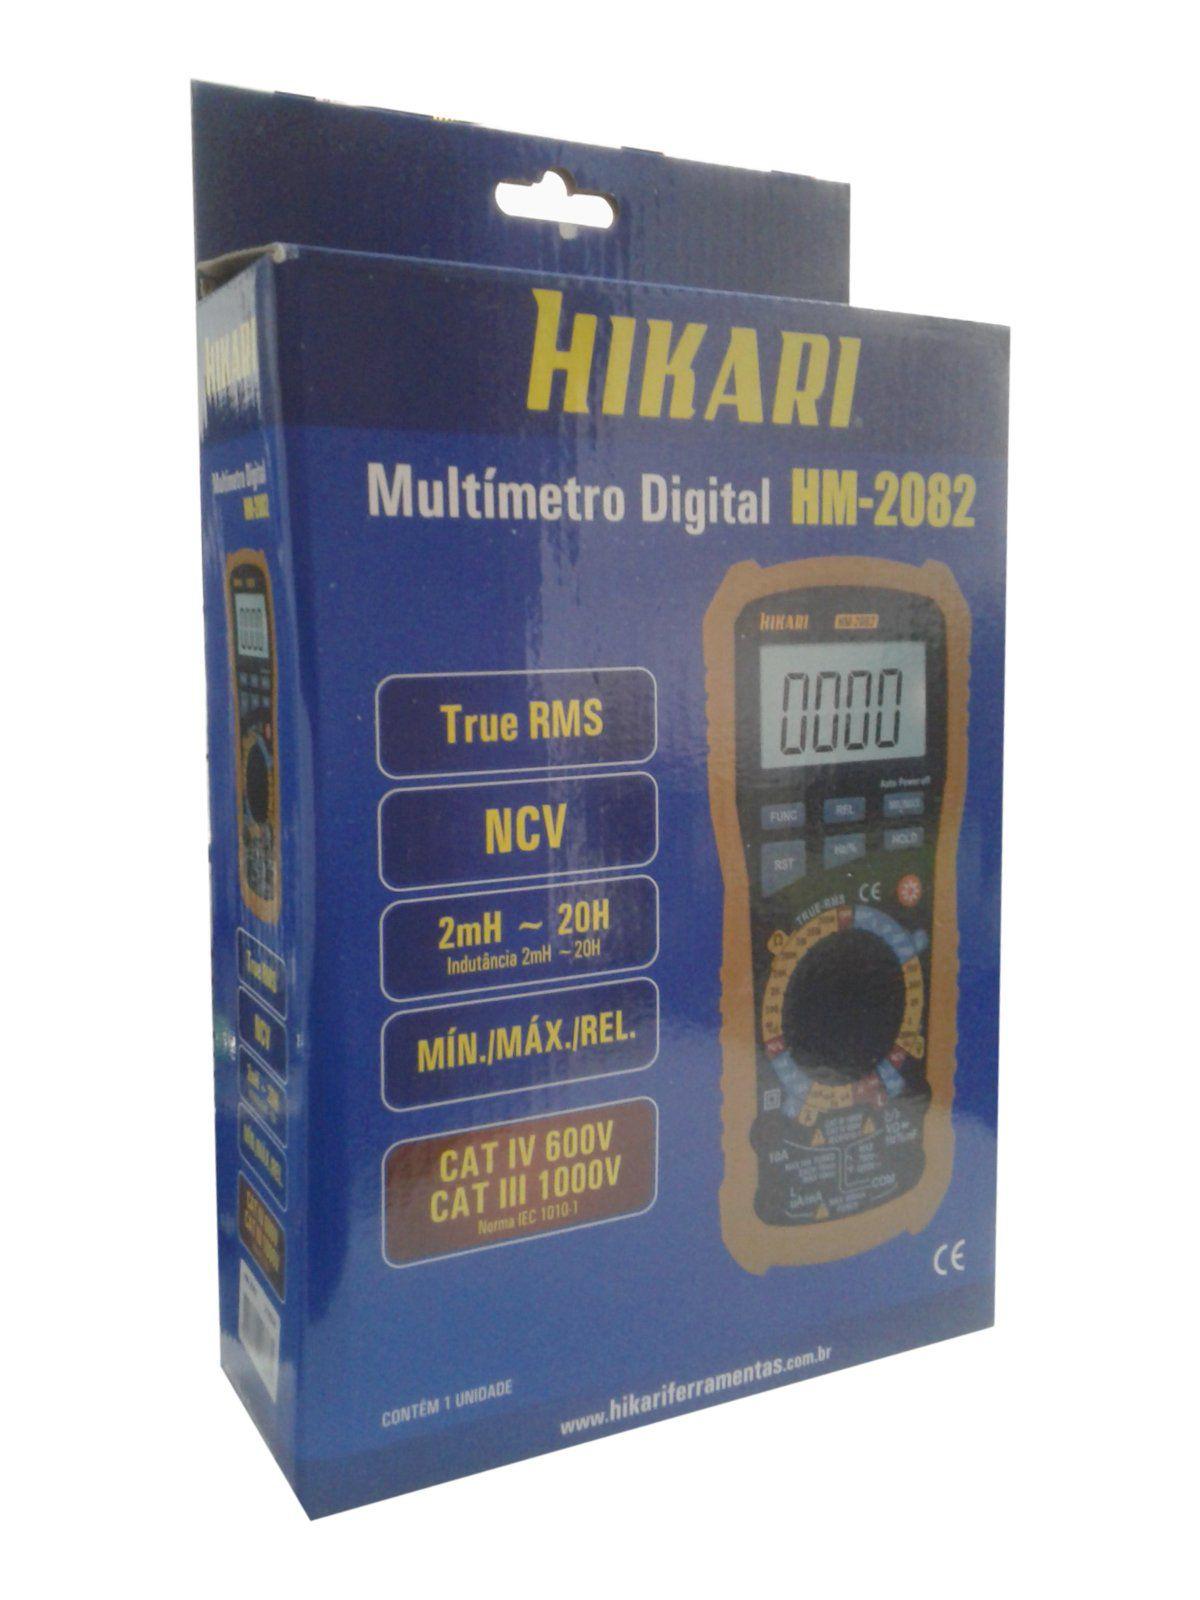 Multímetro Digital True RMS HM-2082 - Hikari  - EMPORIO K